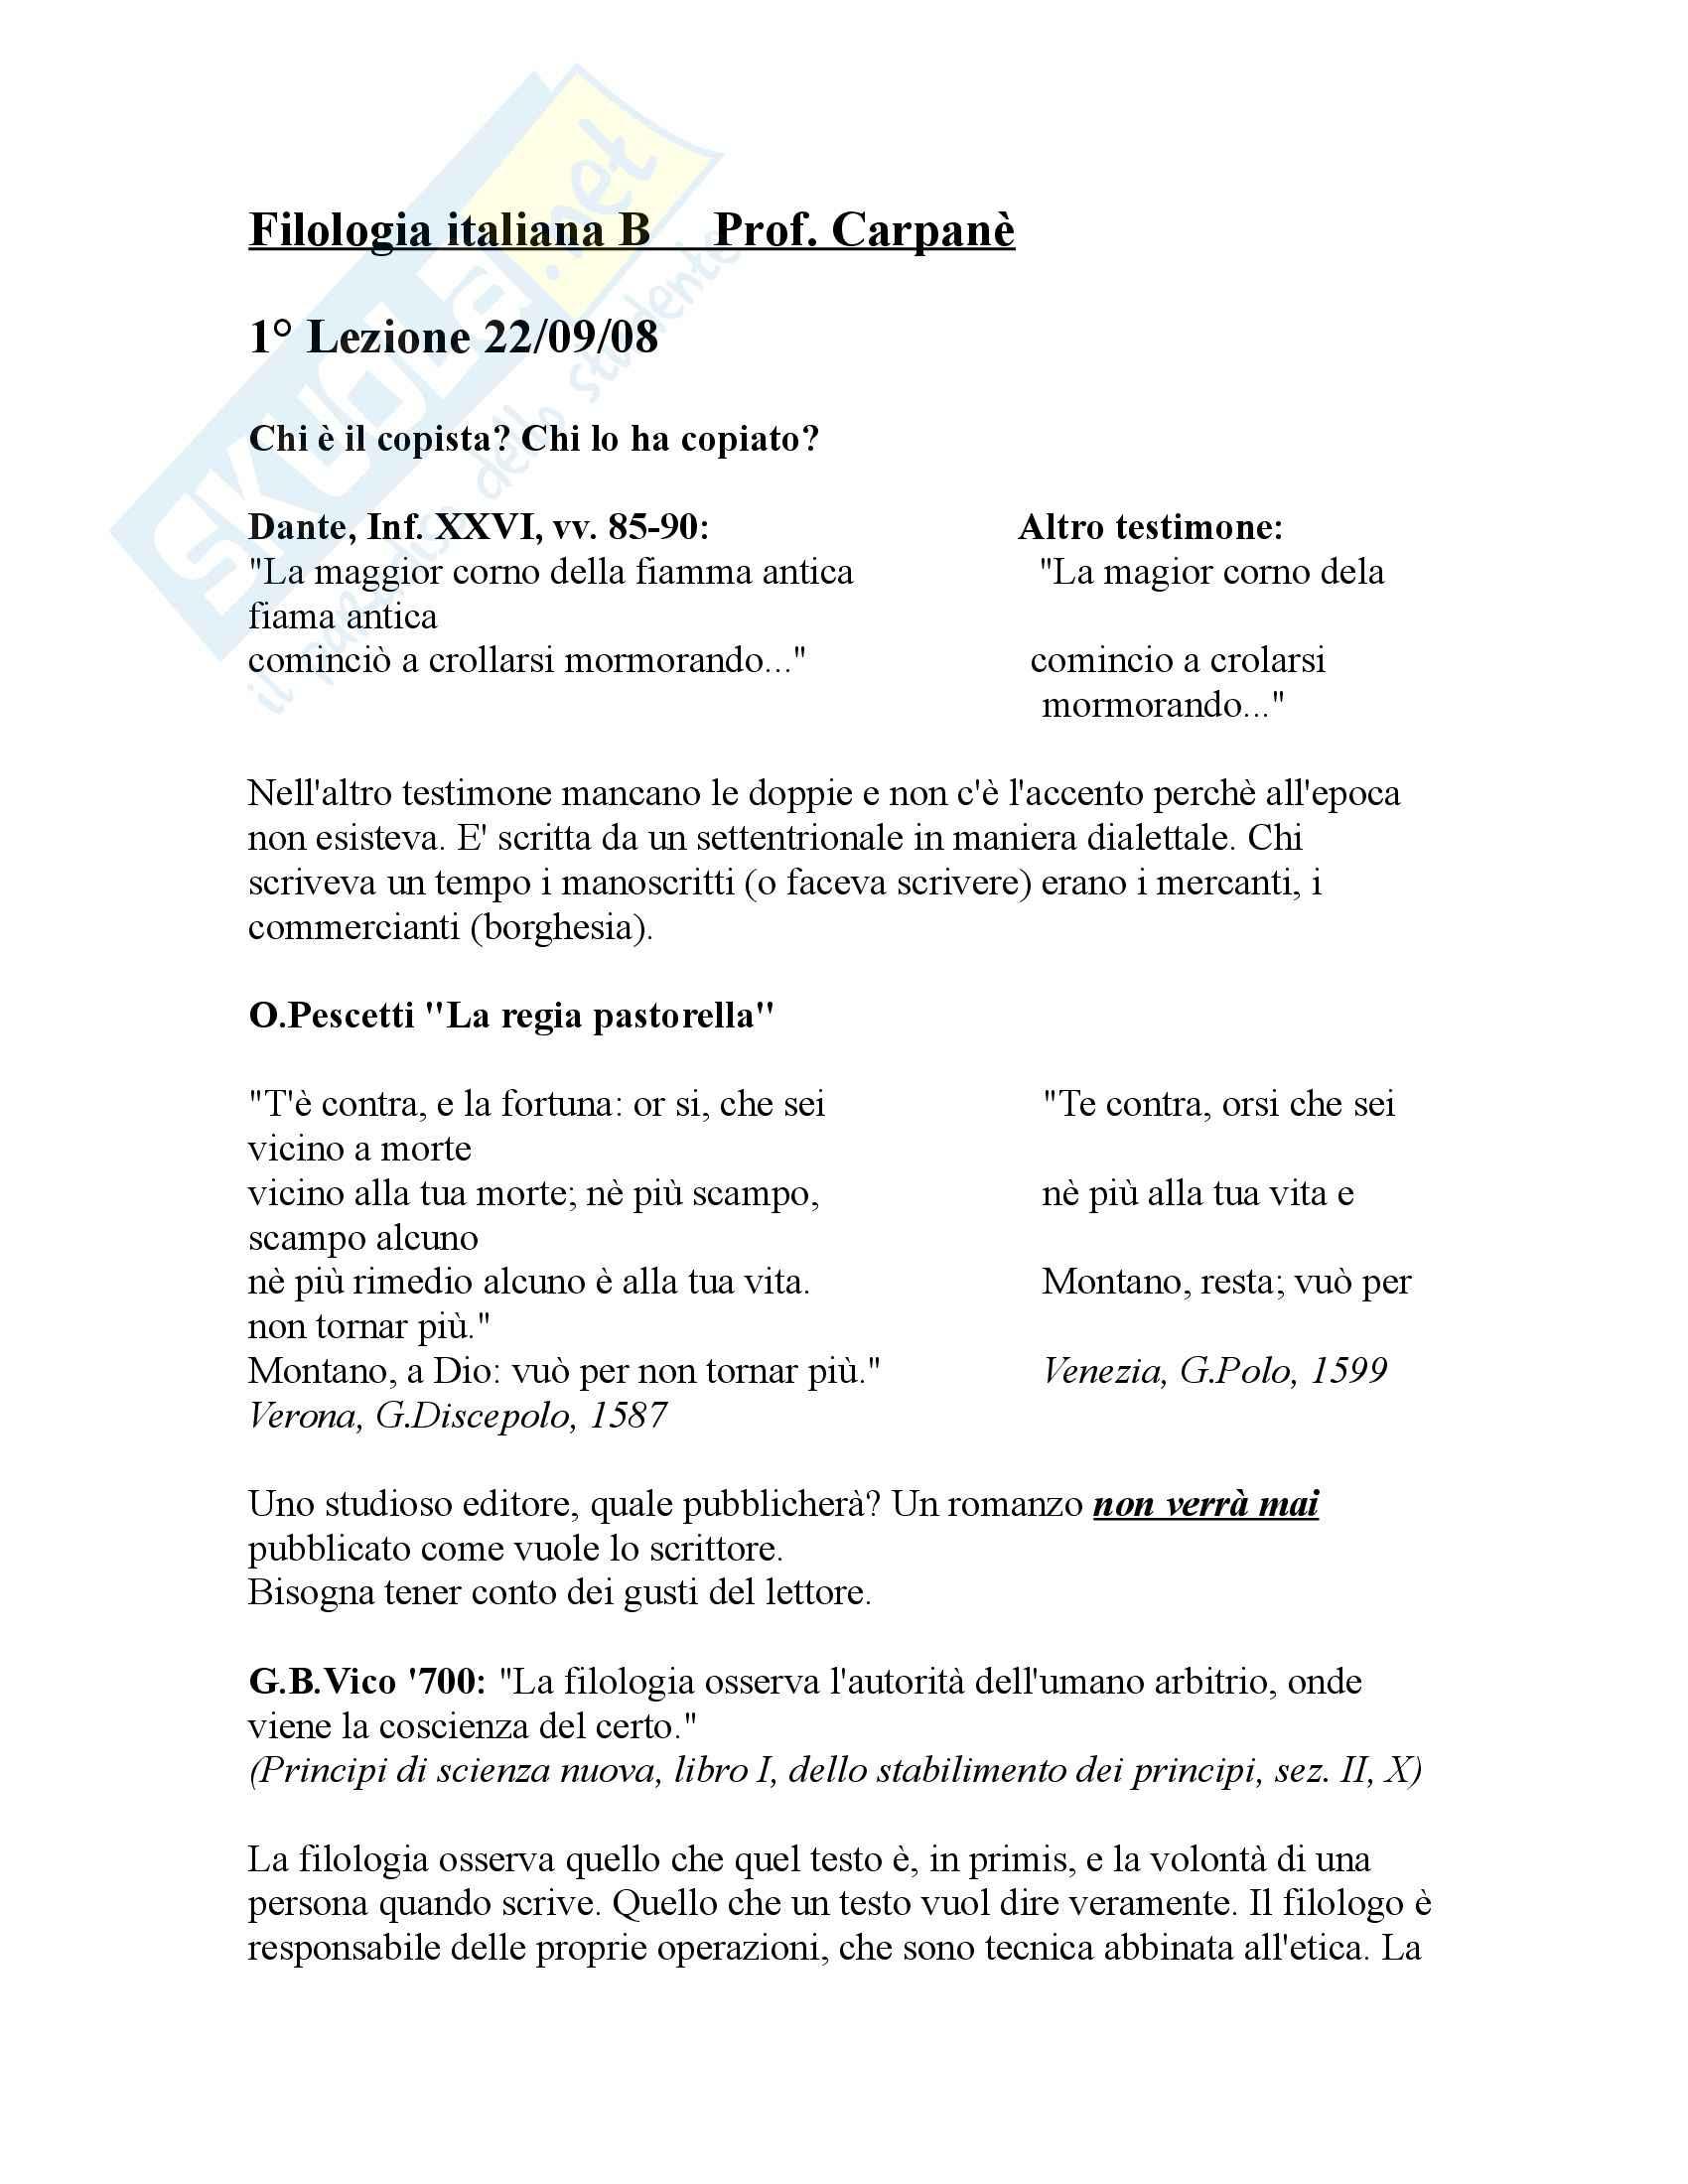 Filologia italiana - Appunti